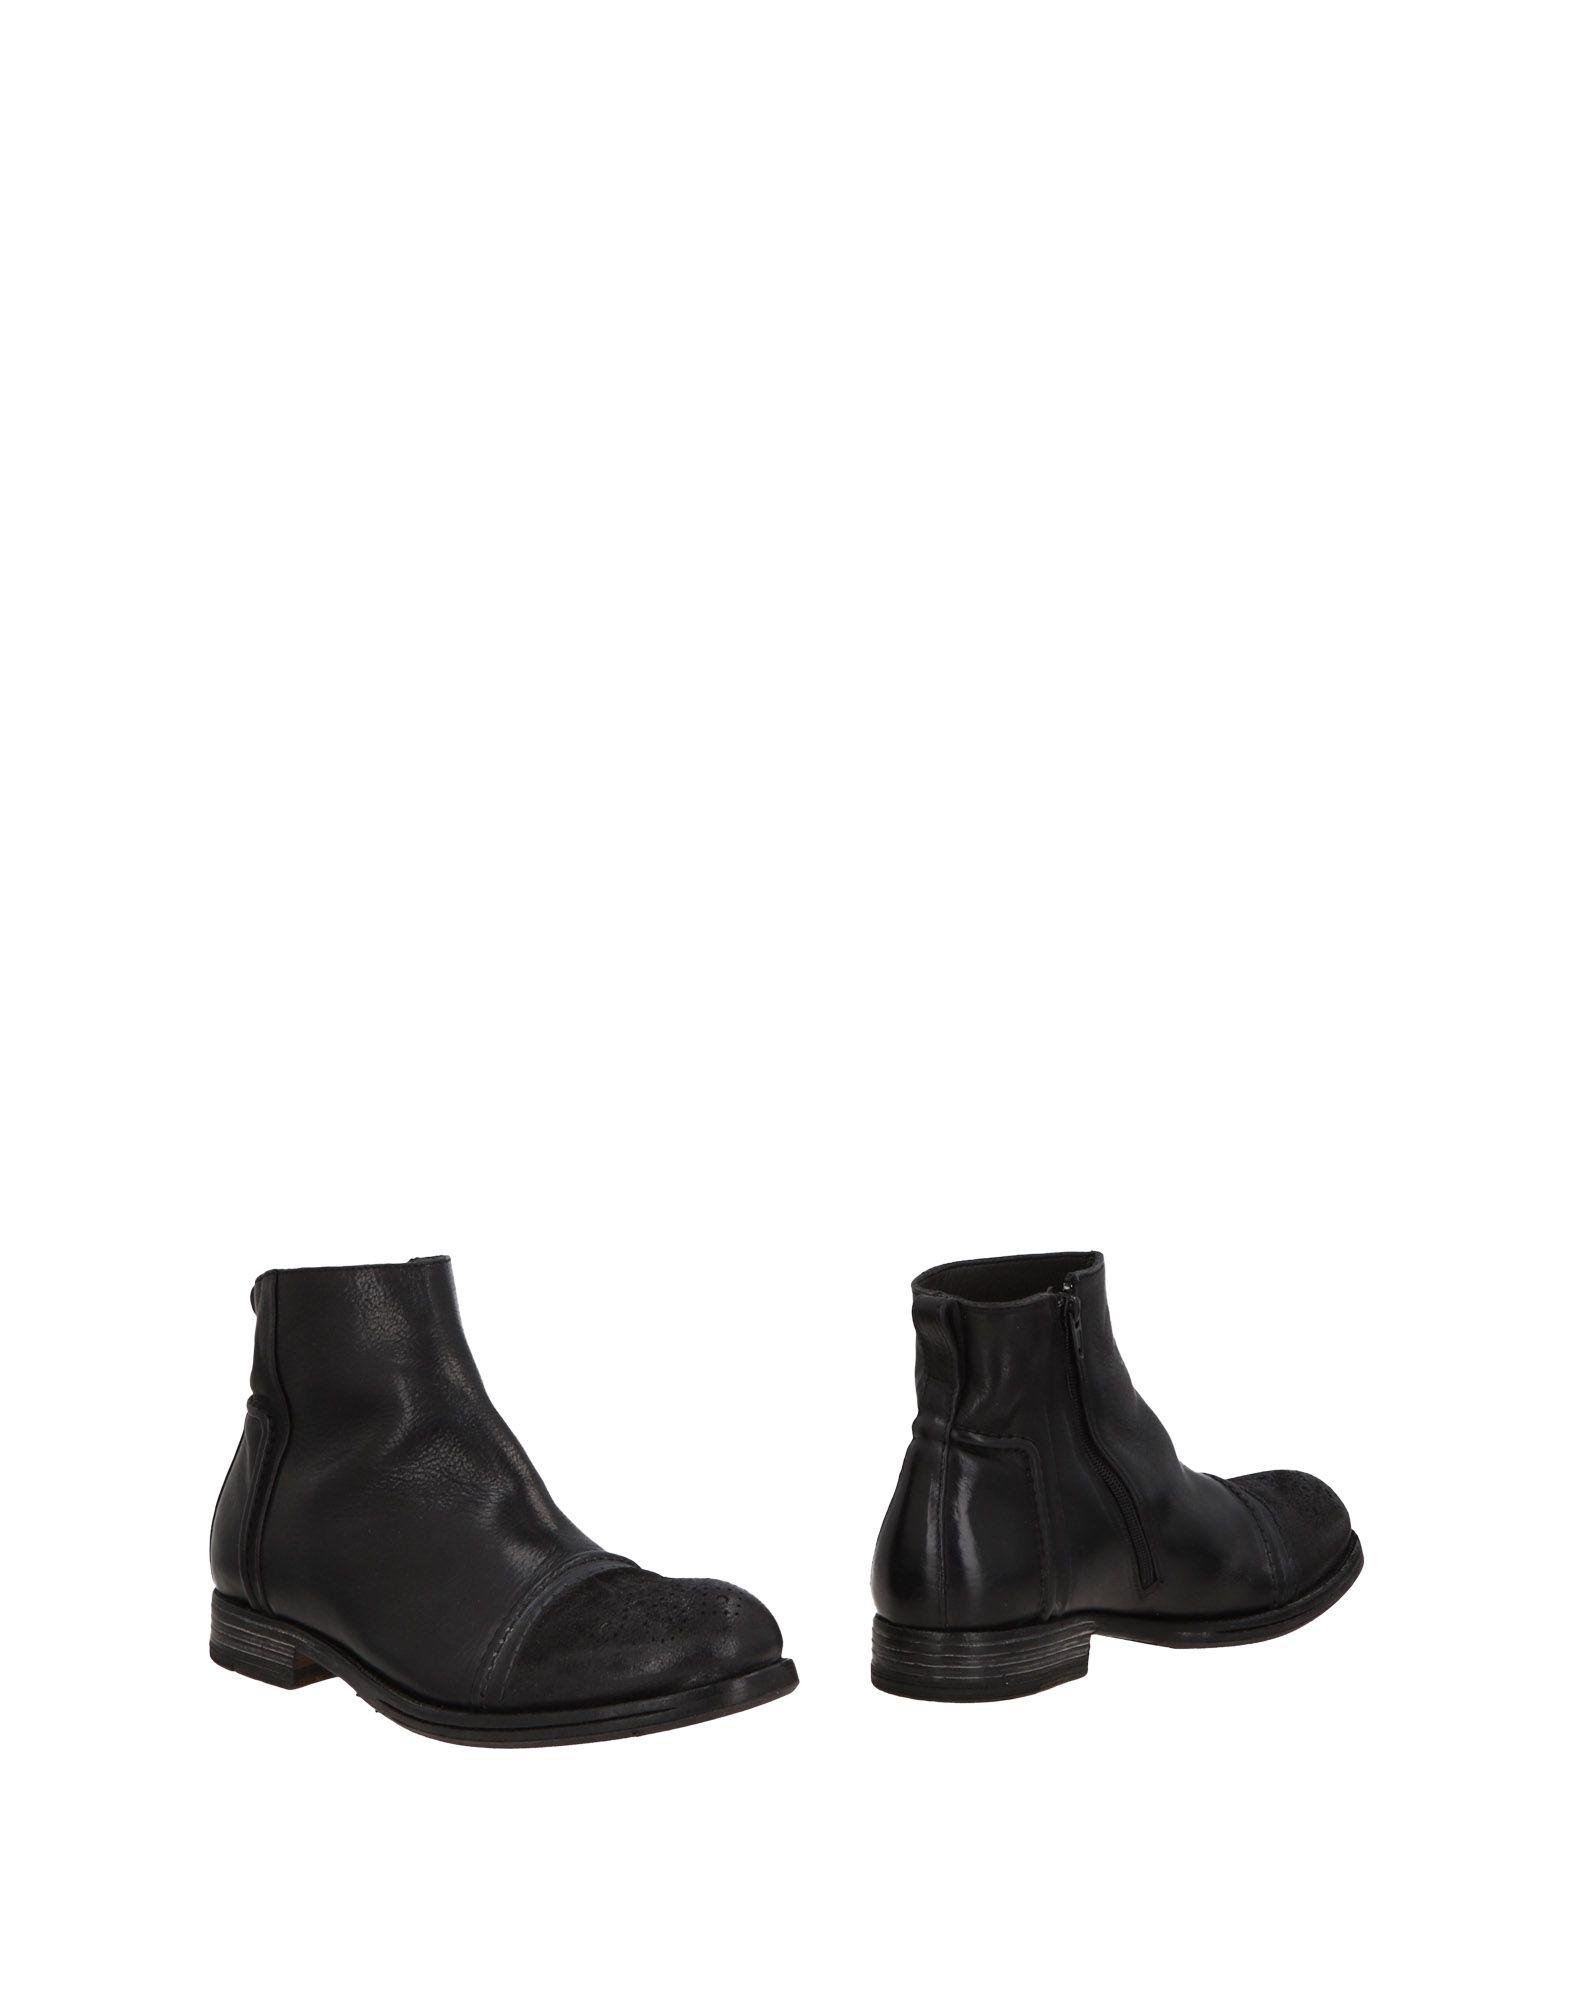 MOMA Полусапоги и высокие ботинки ботинки moma 65701 ca cusna nero